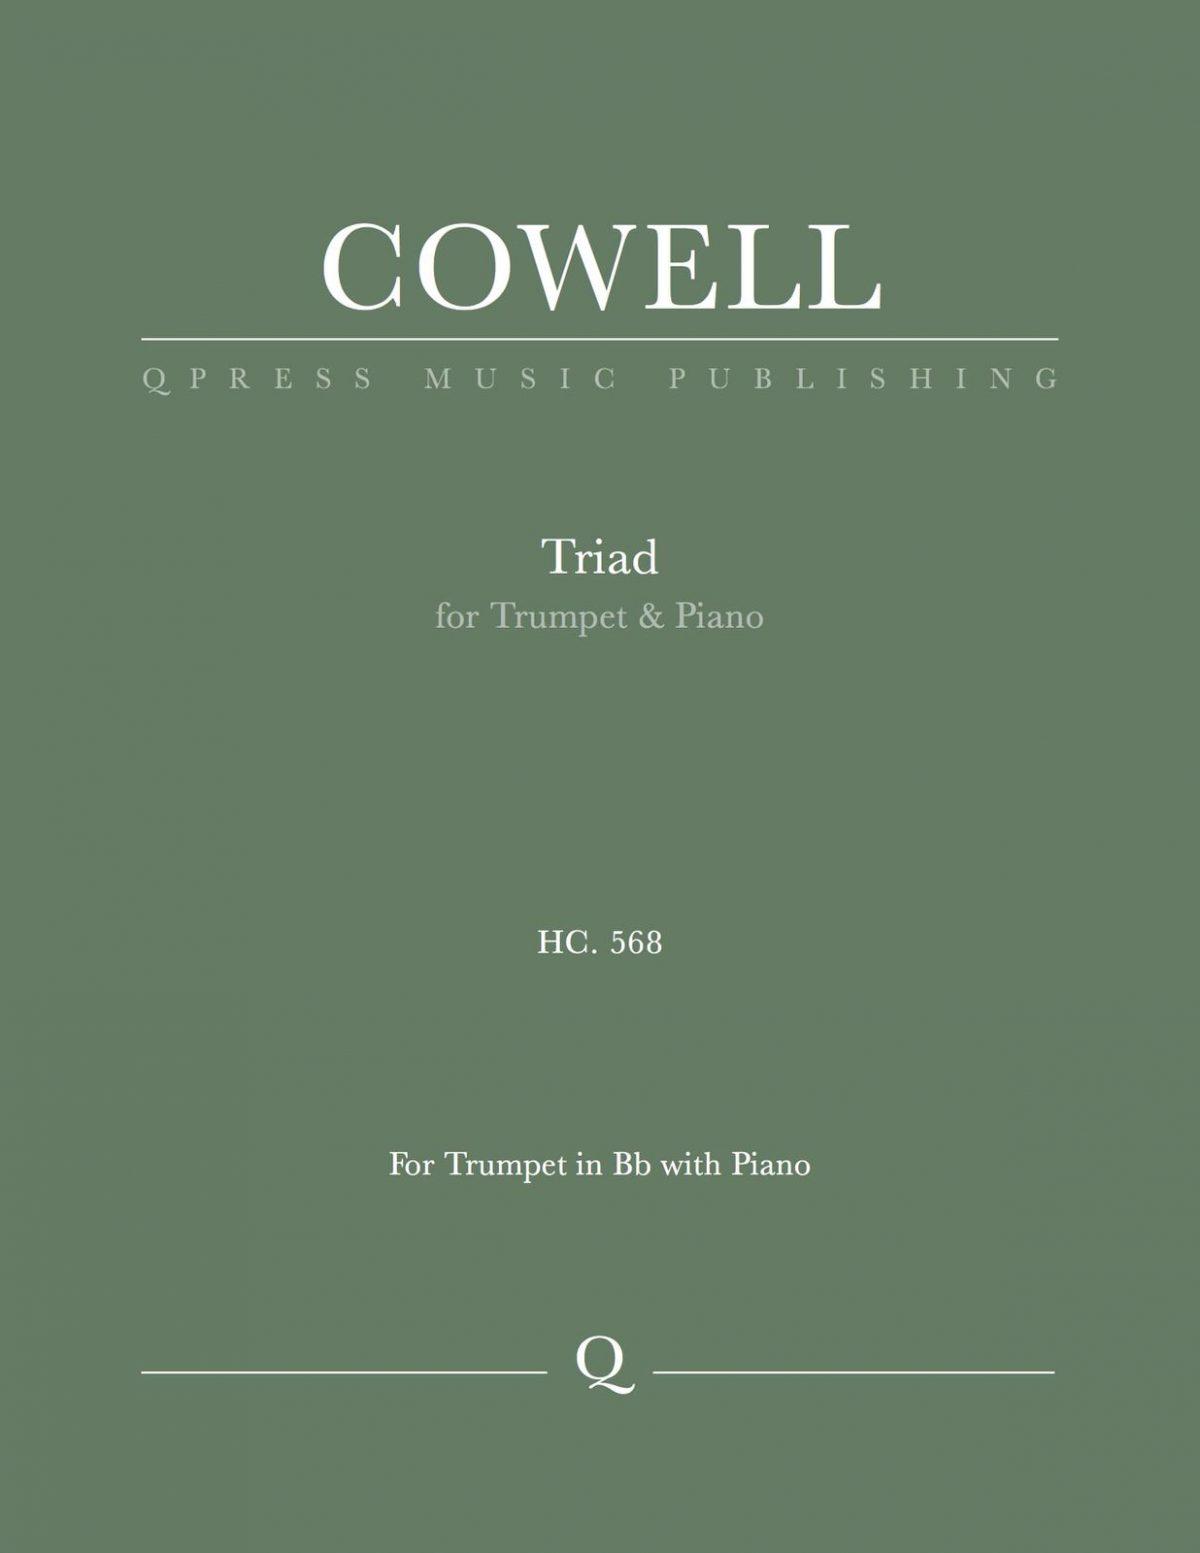 Cowell, Triad, HC 568-p01